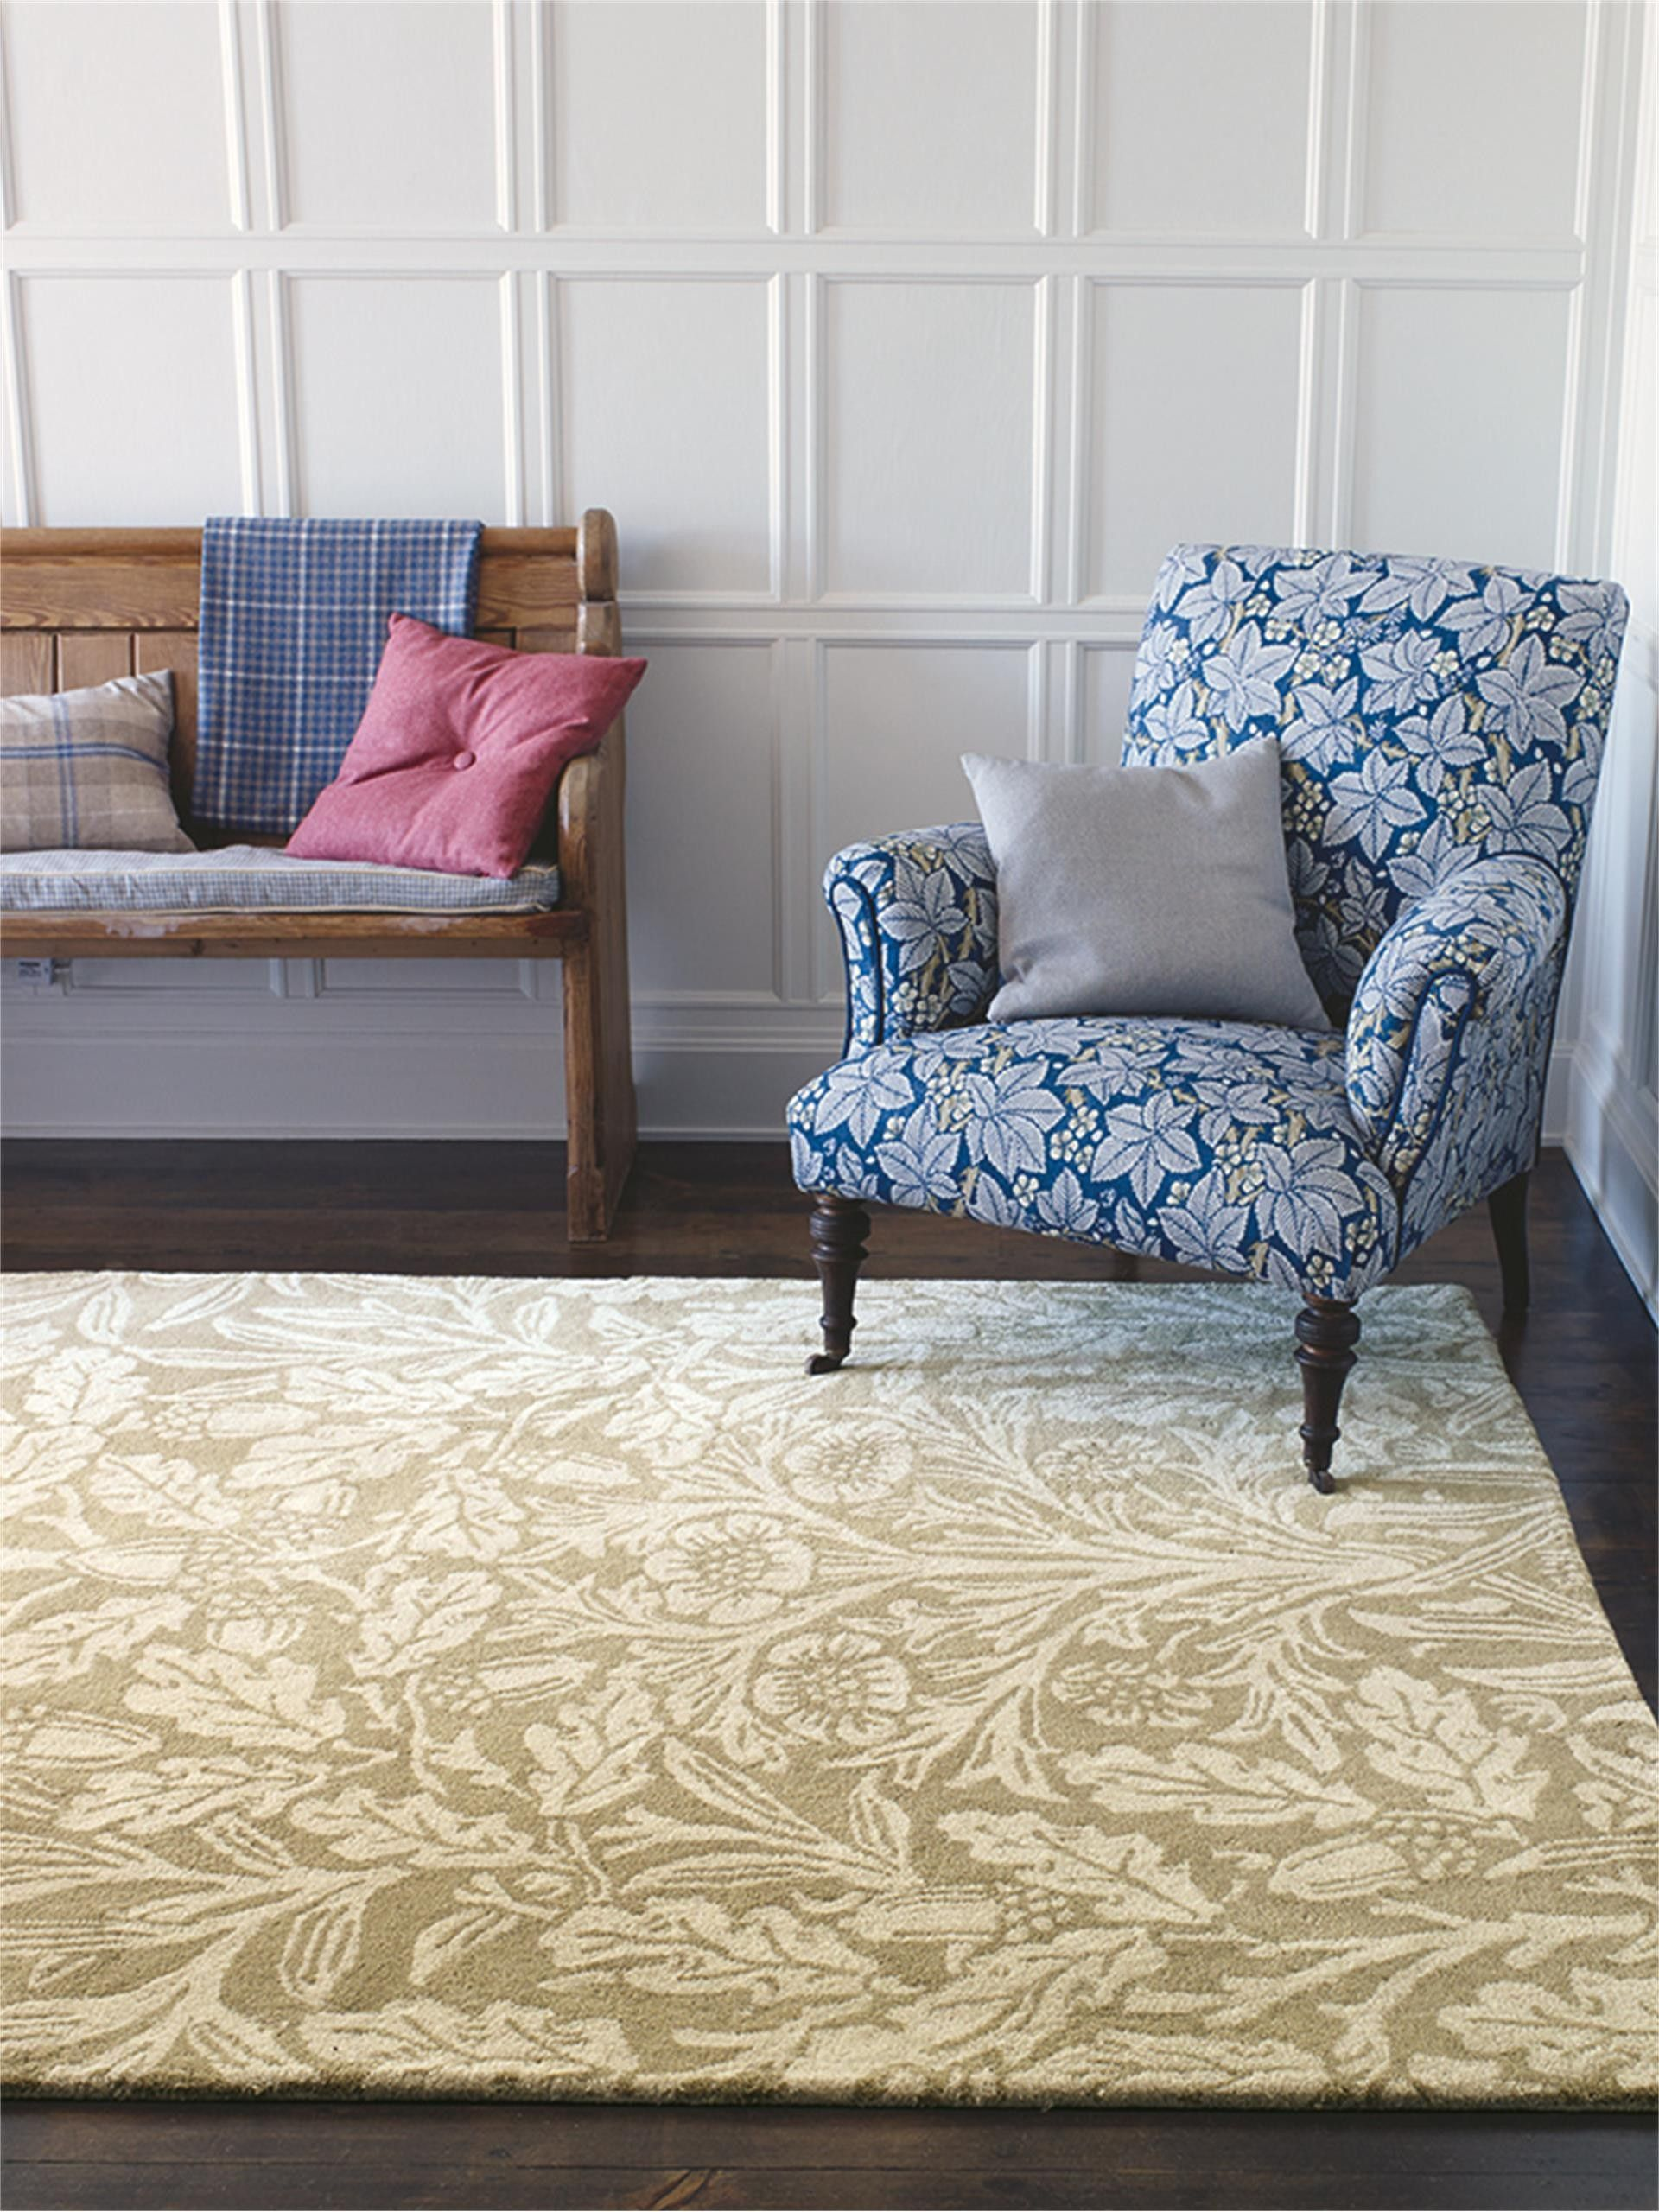 Morris & Co Tappeto di lana Oak prezzi convenienti online